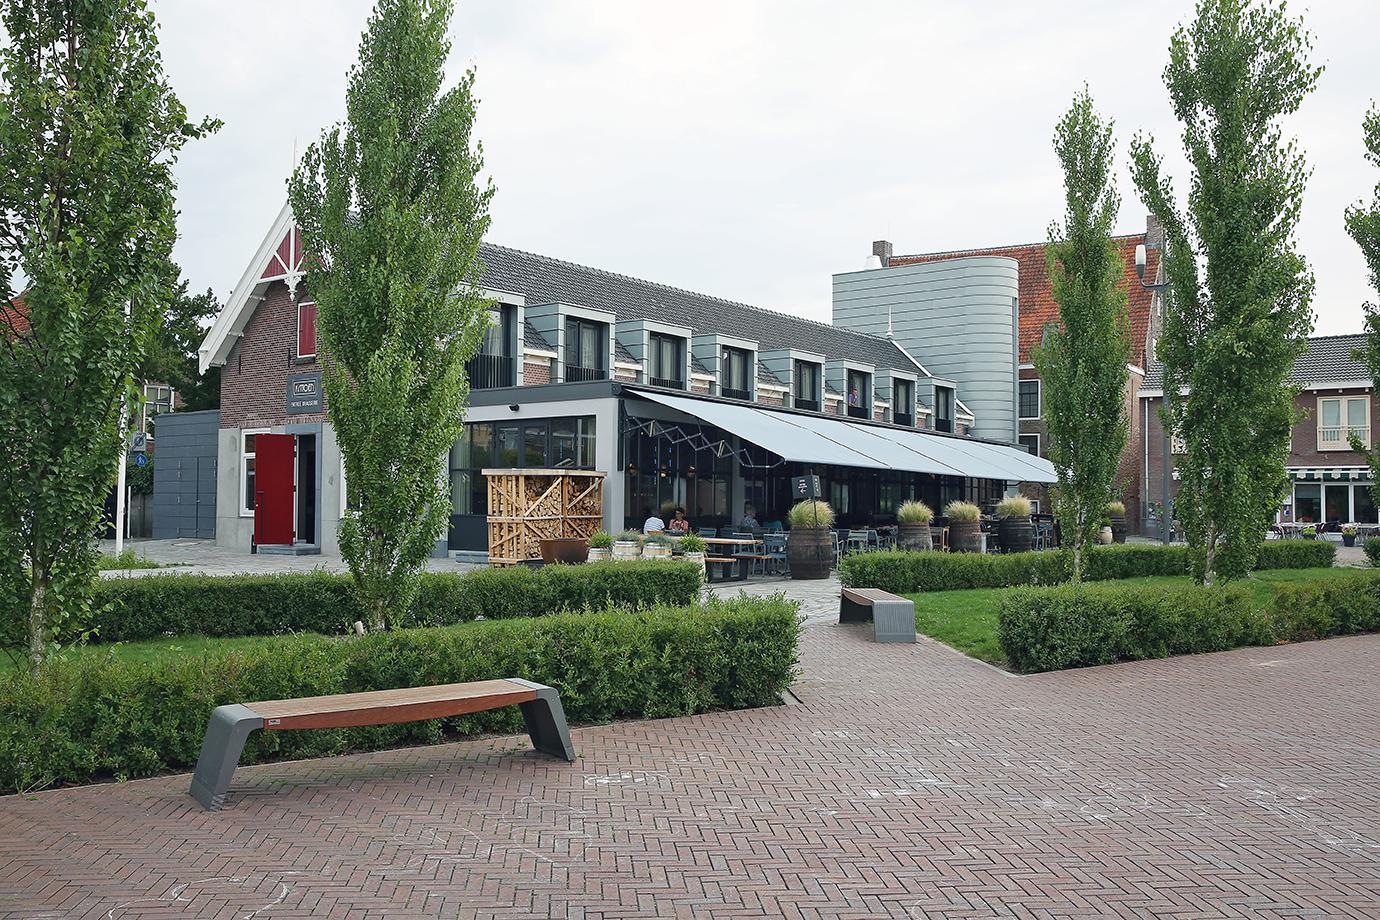 Hotel Brasserie, binnen en buiten zink toegepast